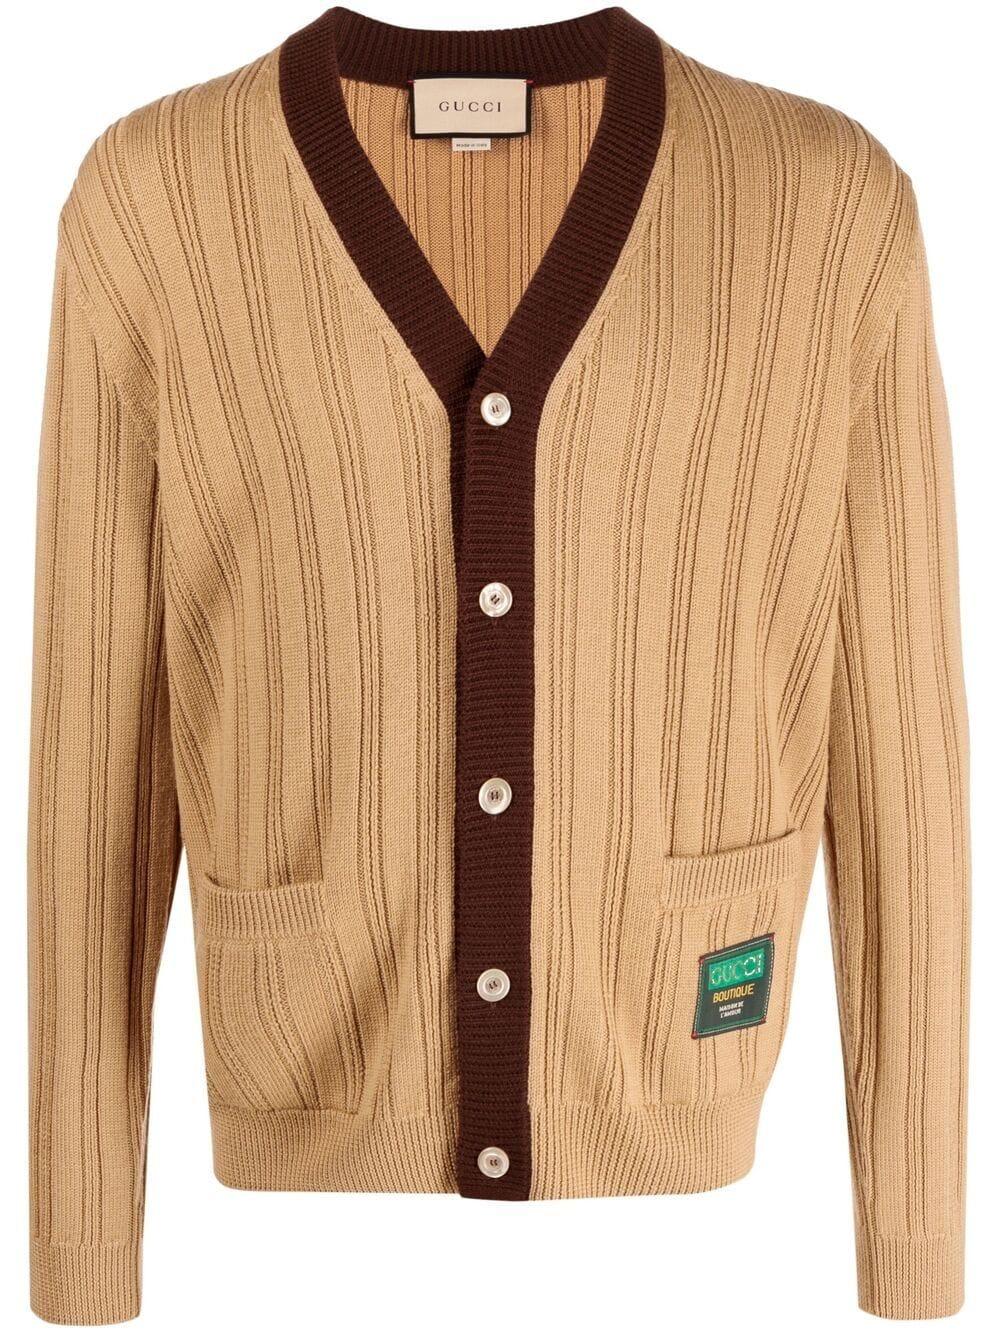 Camel brown wool cardigan featuring ribbed knit GUCCI |  | 646809-XKBQT2668